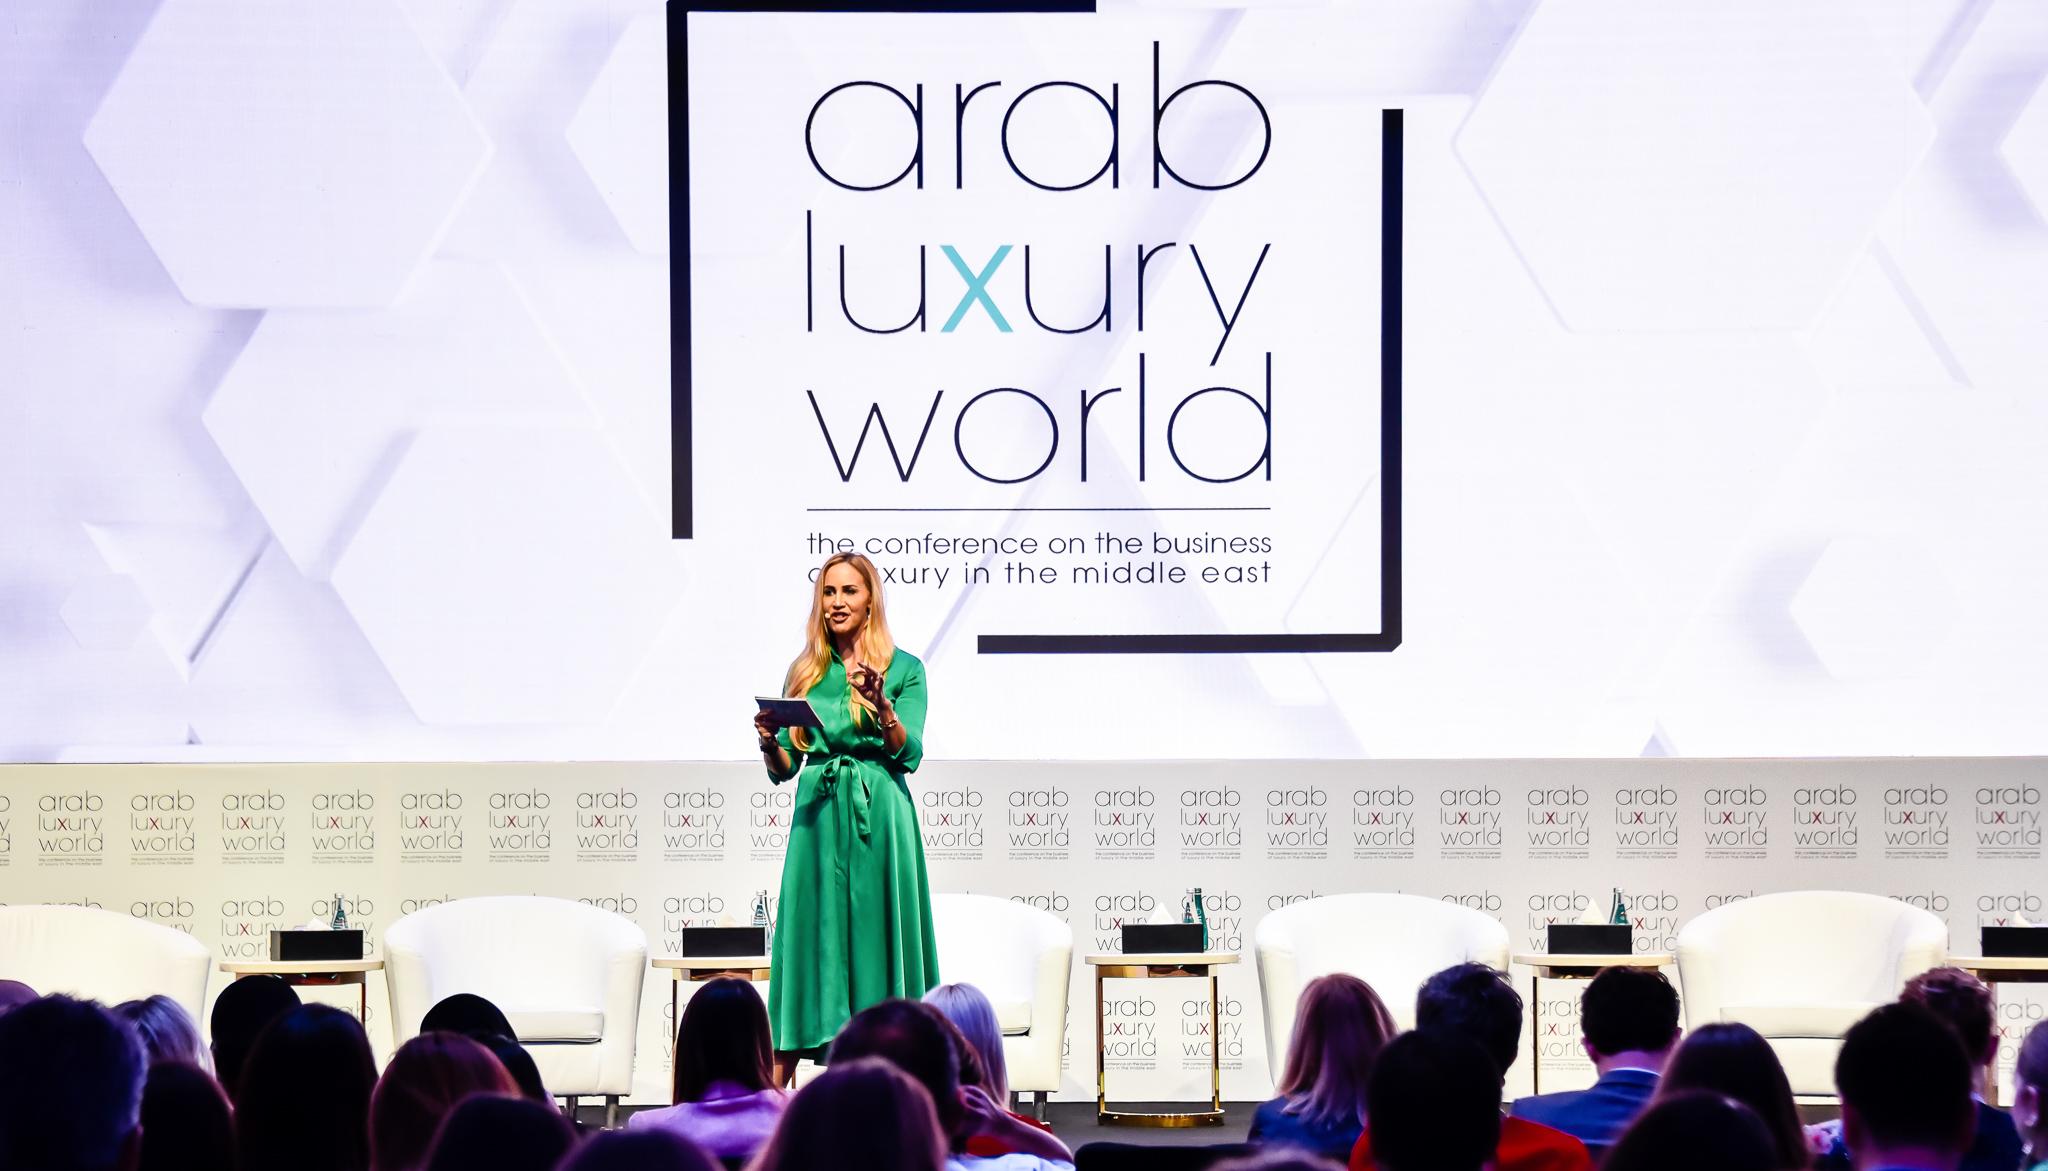 Arab Luxury World conference host, June 2019